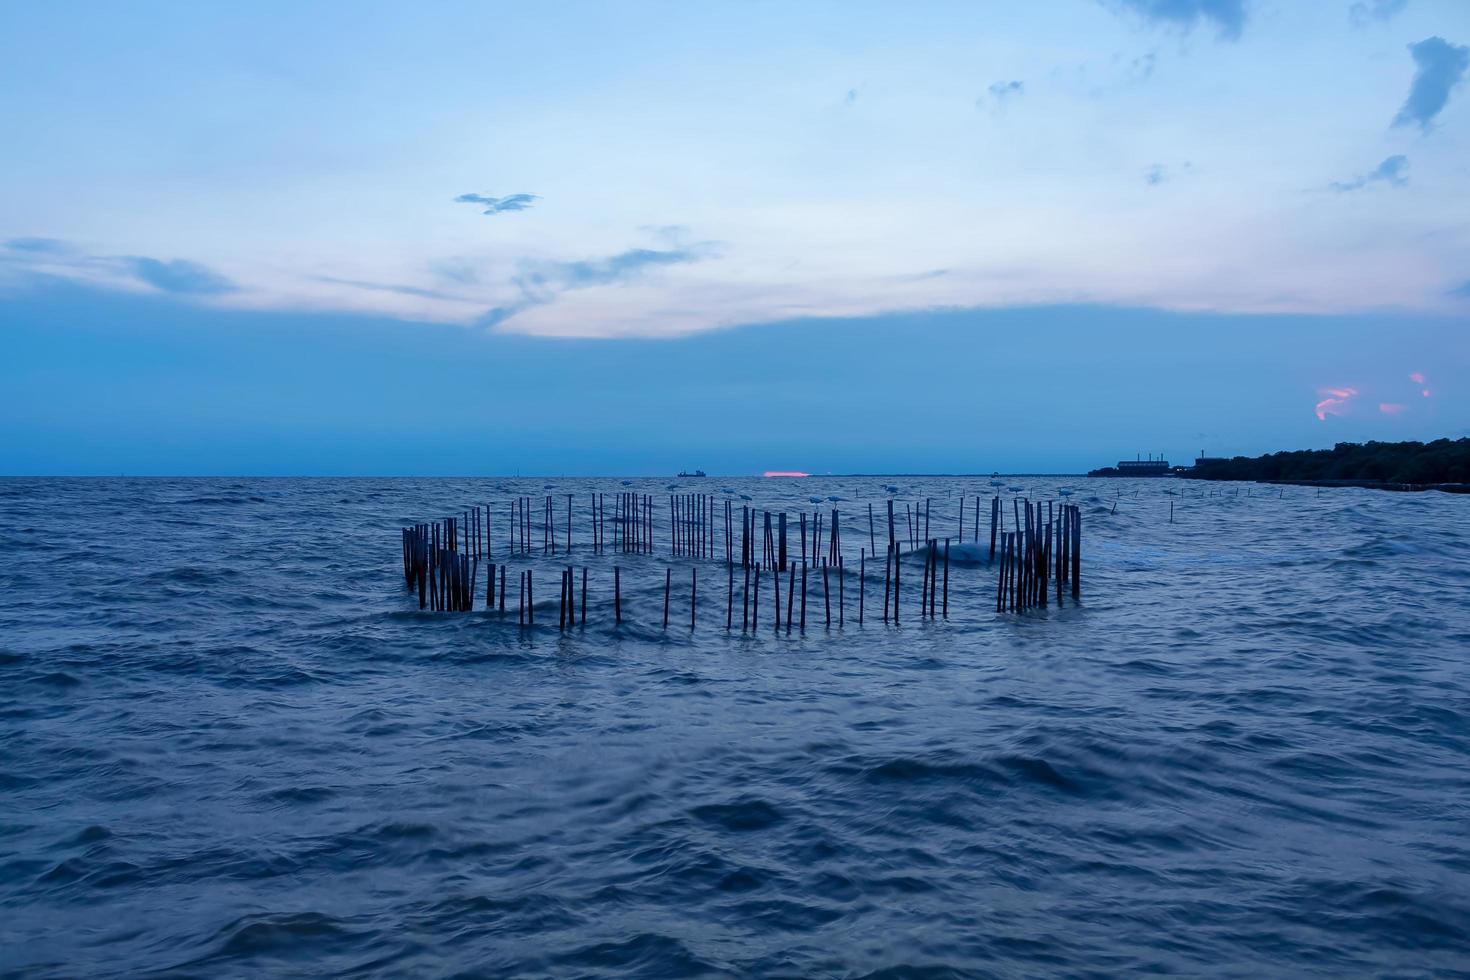 hart gevormd bamboe in het overzees in prakan samut, Thailand foto